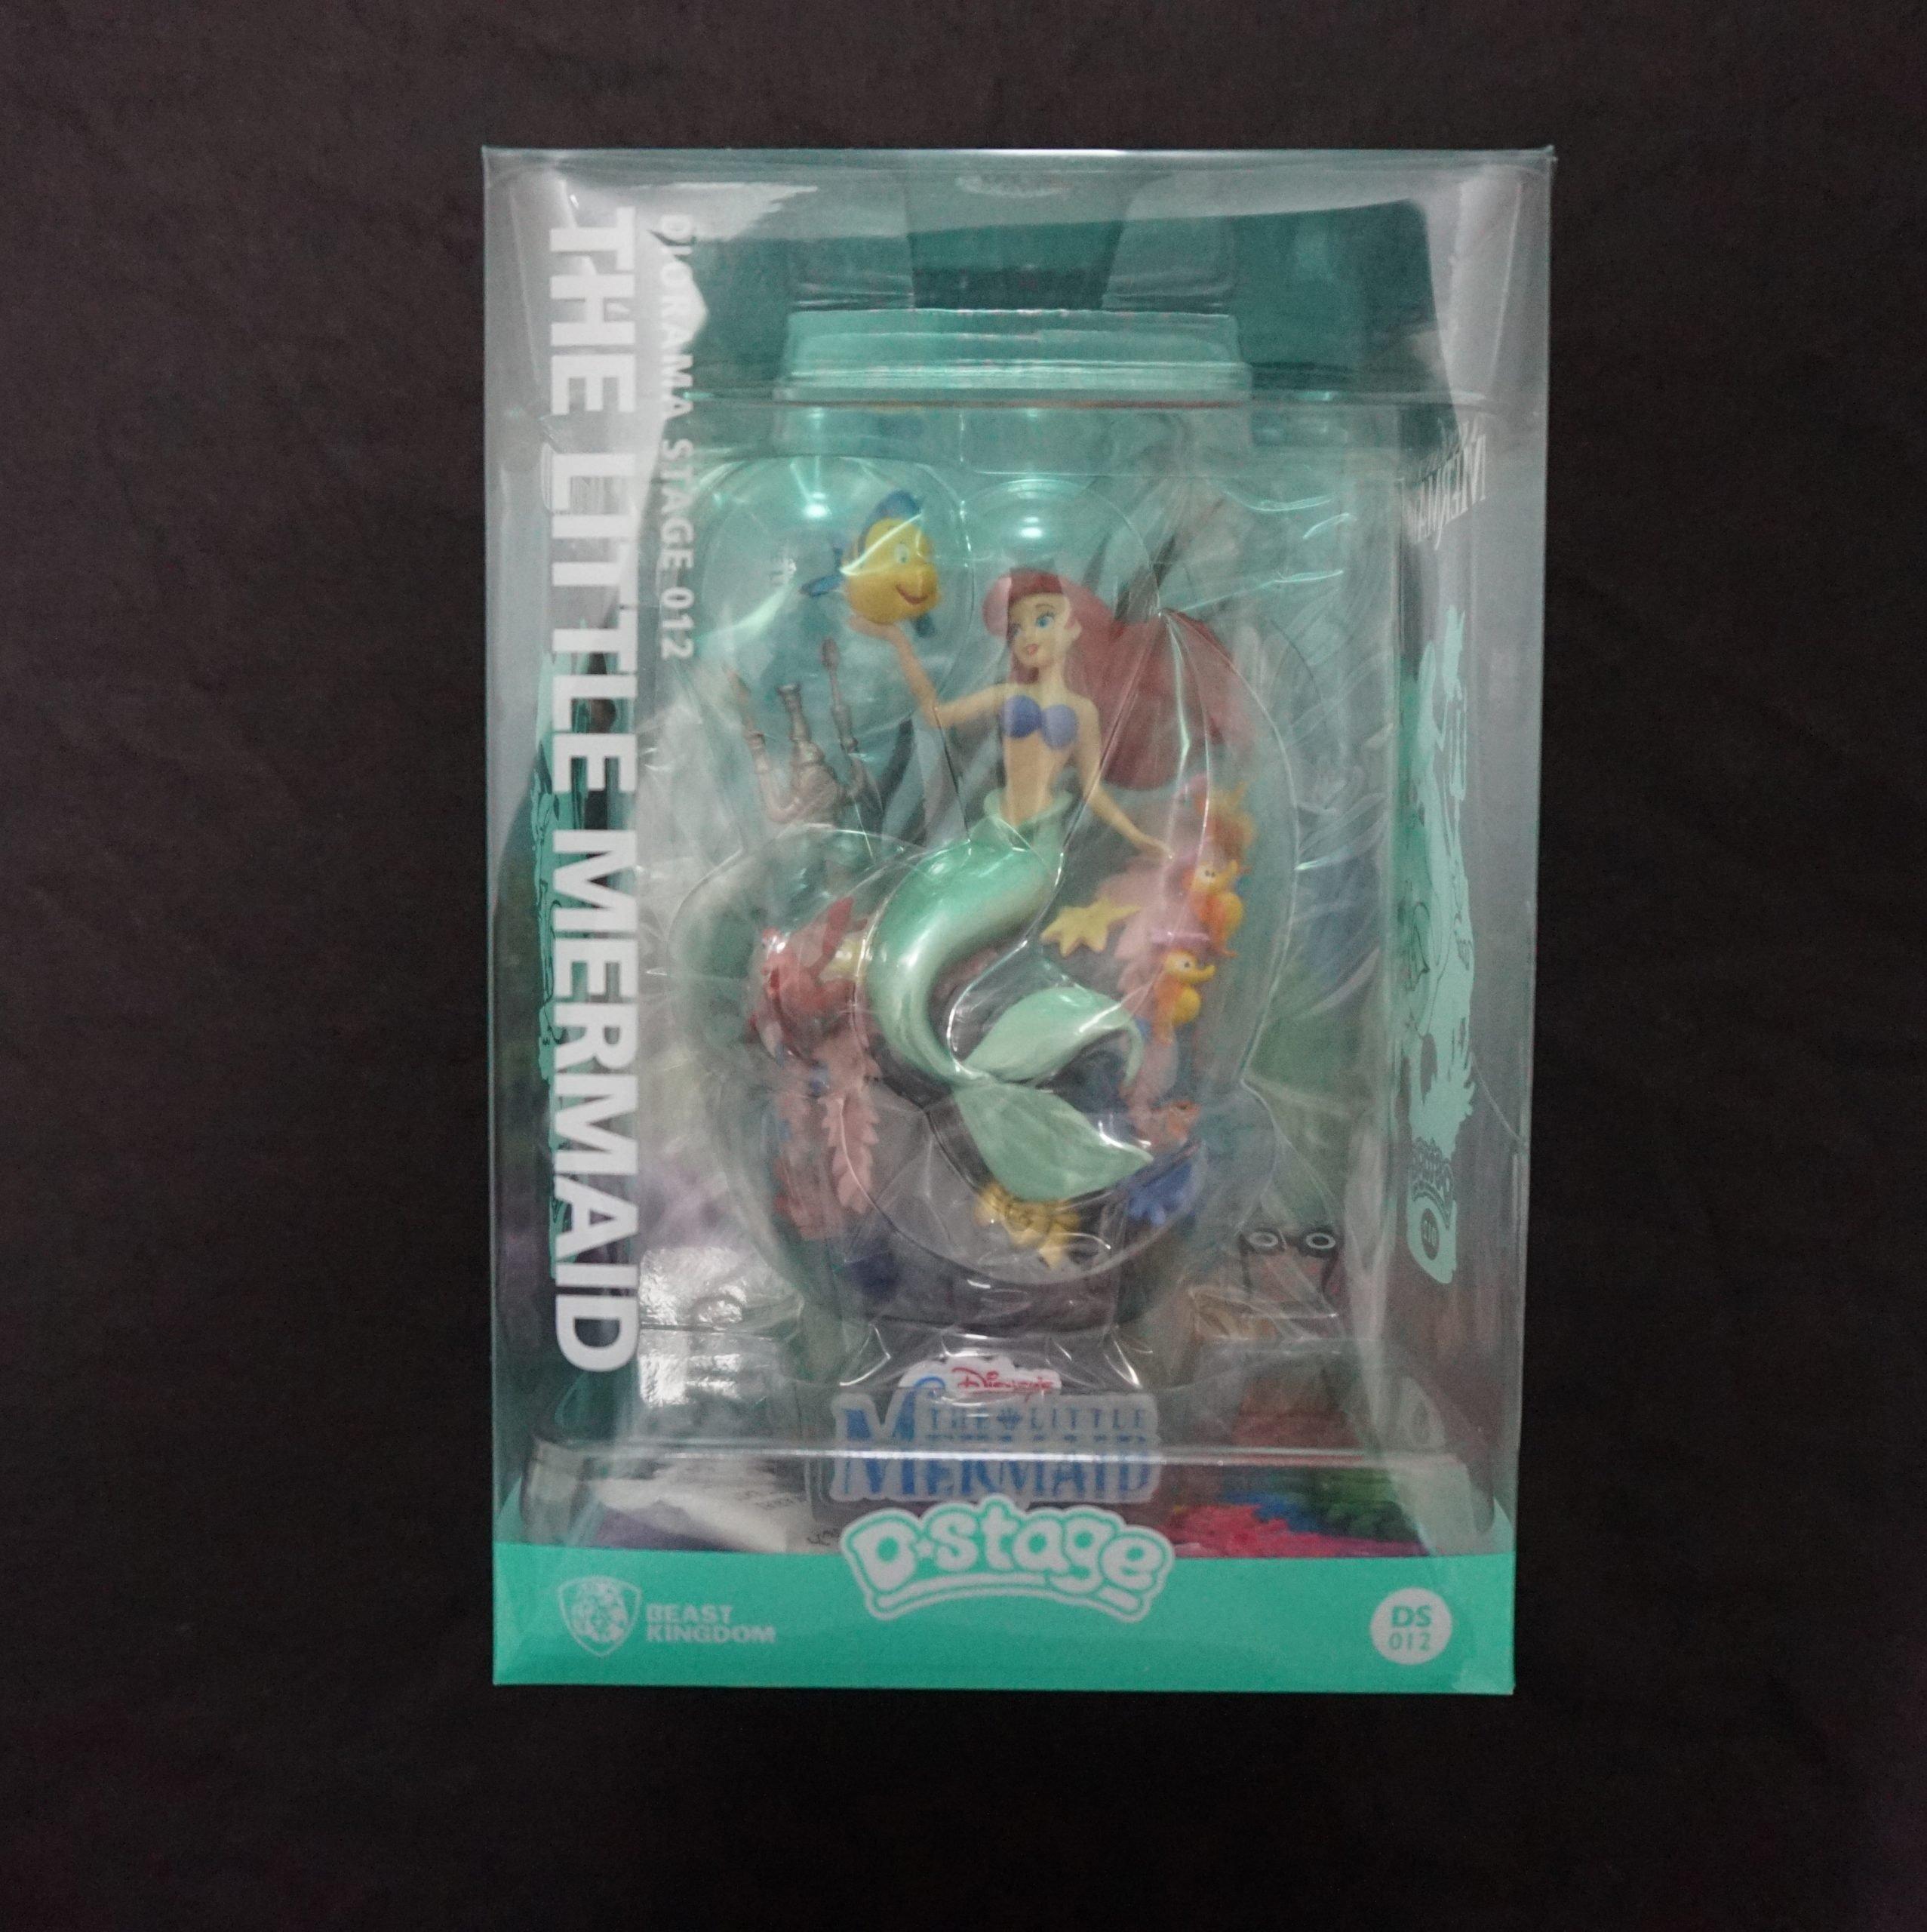 The Little Mermaid (Ariel) D-Stage